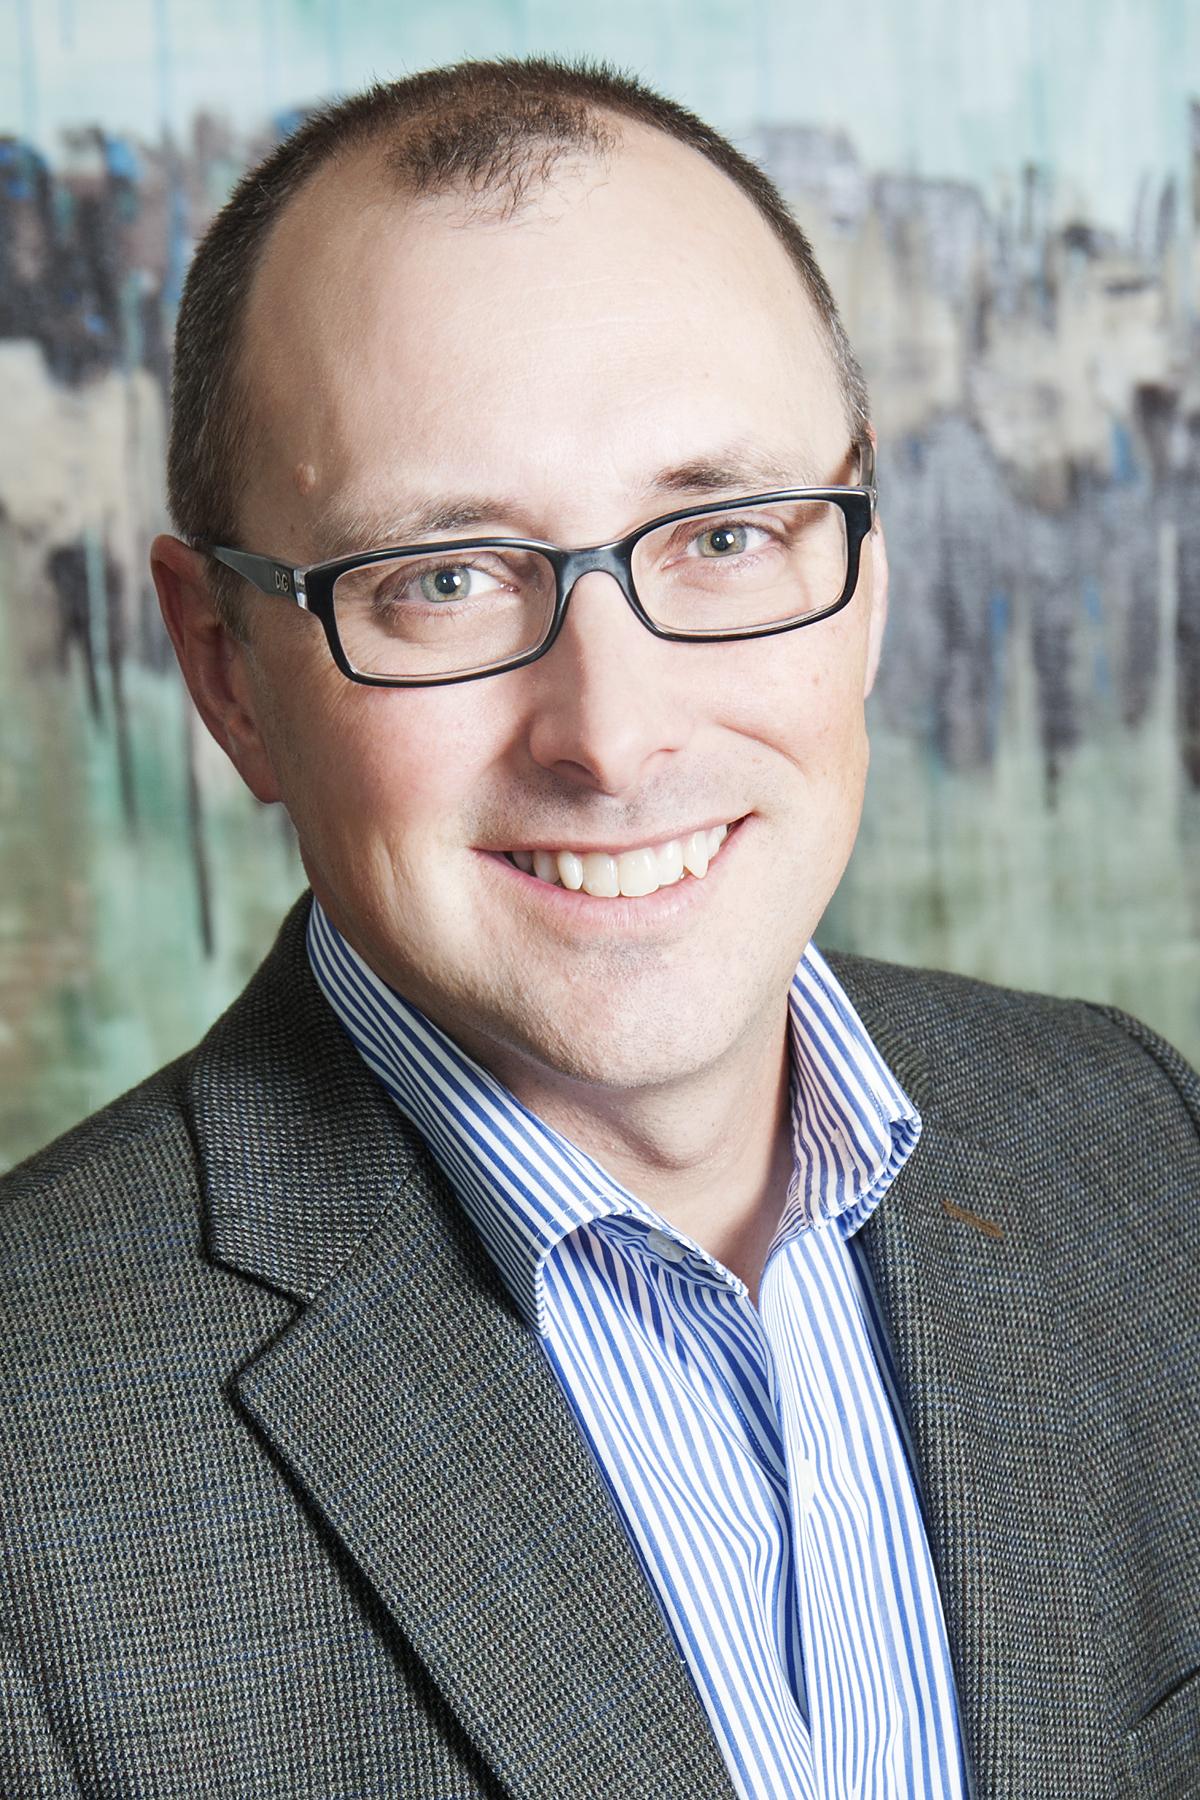 Corporate Portrait, Jean-Charles Lanciault, Entrepreneur, Project Manager, Communicator and CSR Enthusiast